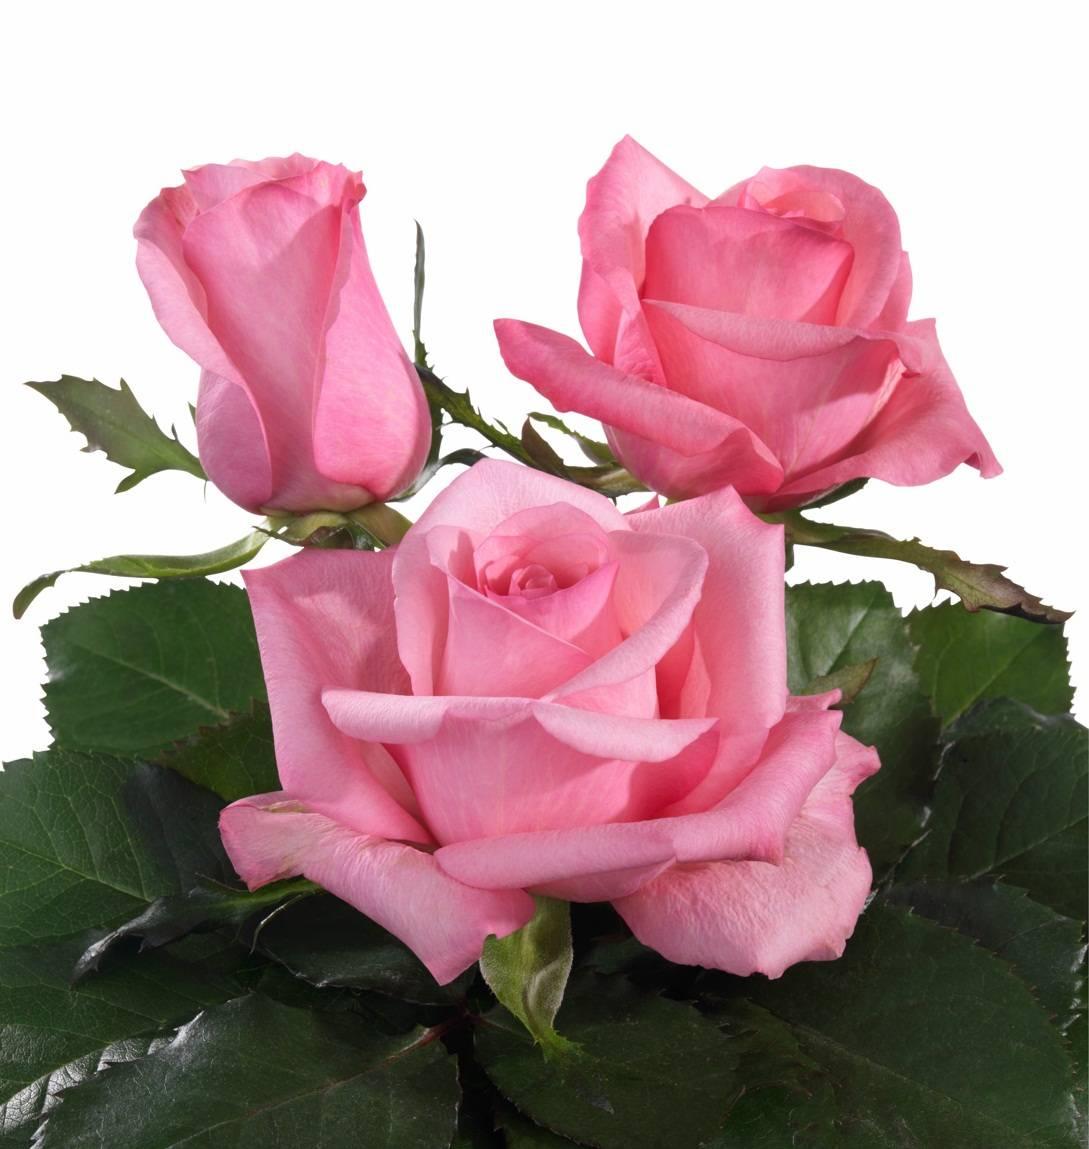 Lovely Jubilee pink rose